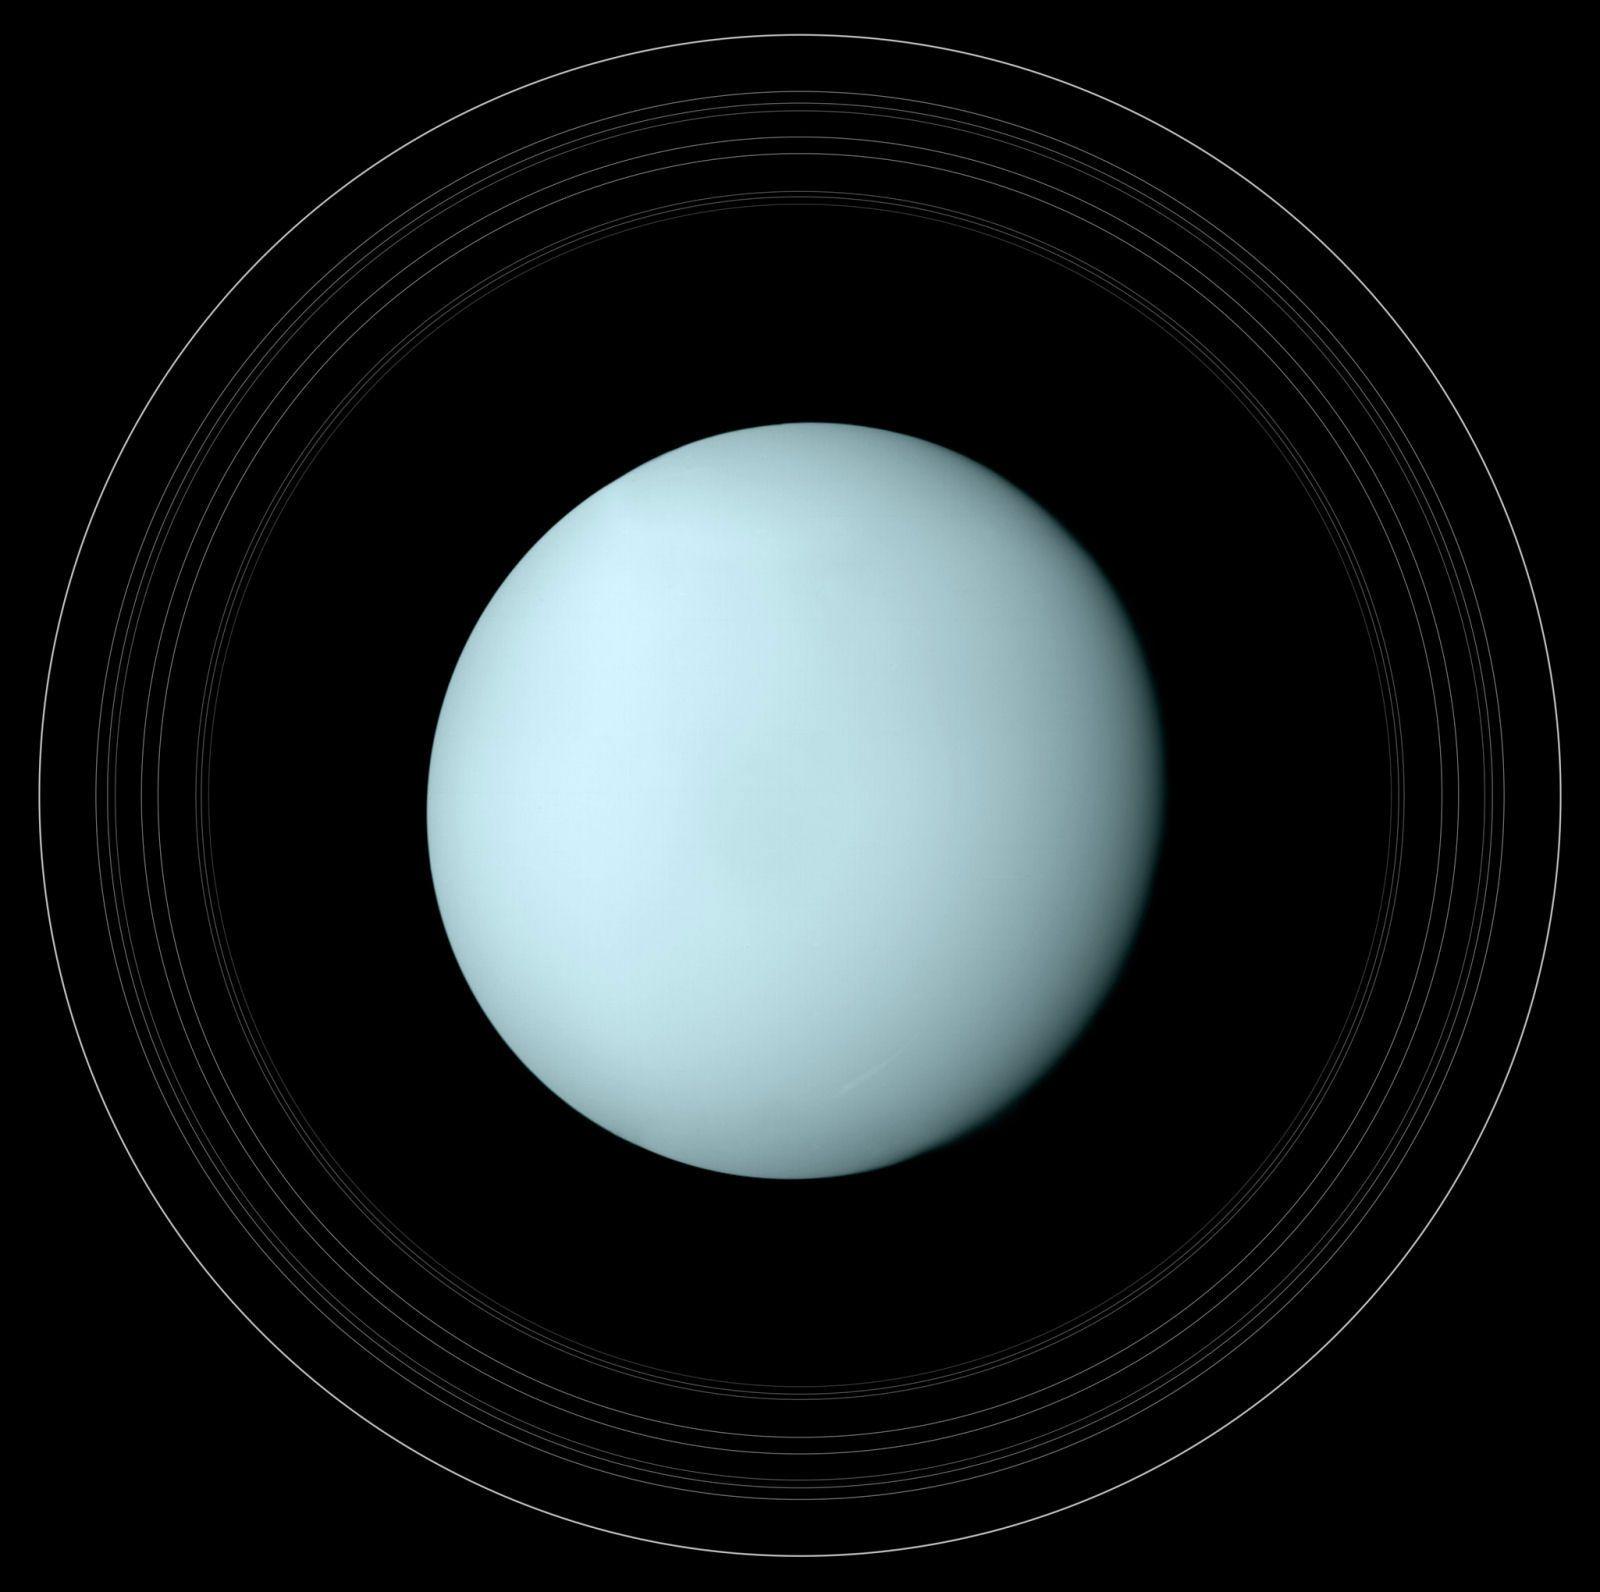 Uranus Coloring Page Education Com Planet Coloring Pages Uranus Solar System Facts